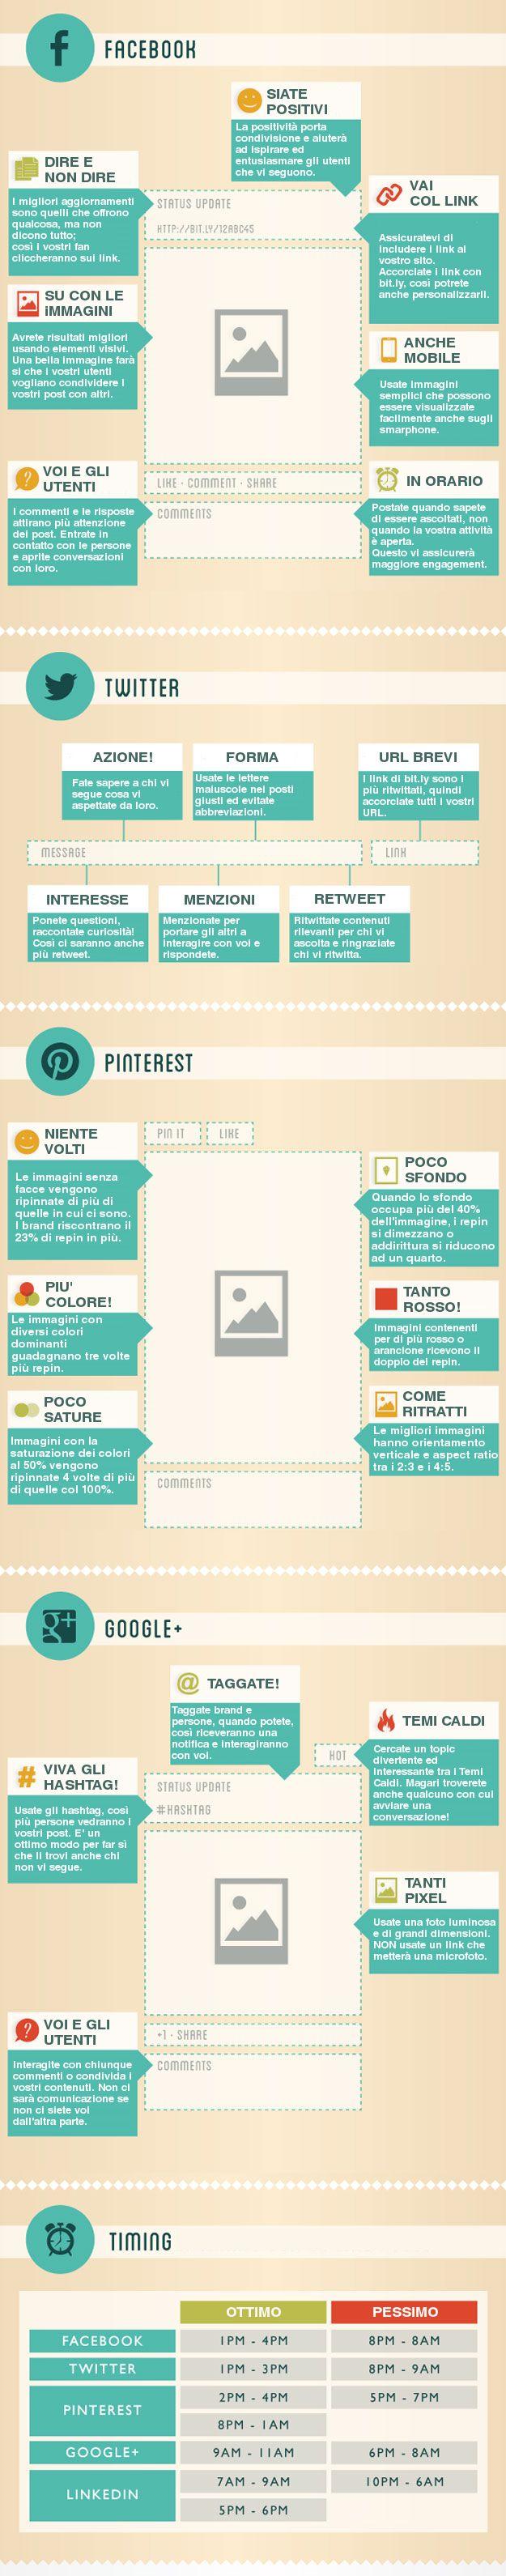 Tips and Tricks #SMM #SocialNetwork #Facebook #Twitter #Pinterest